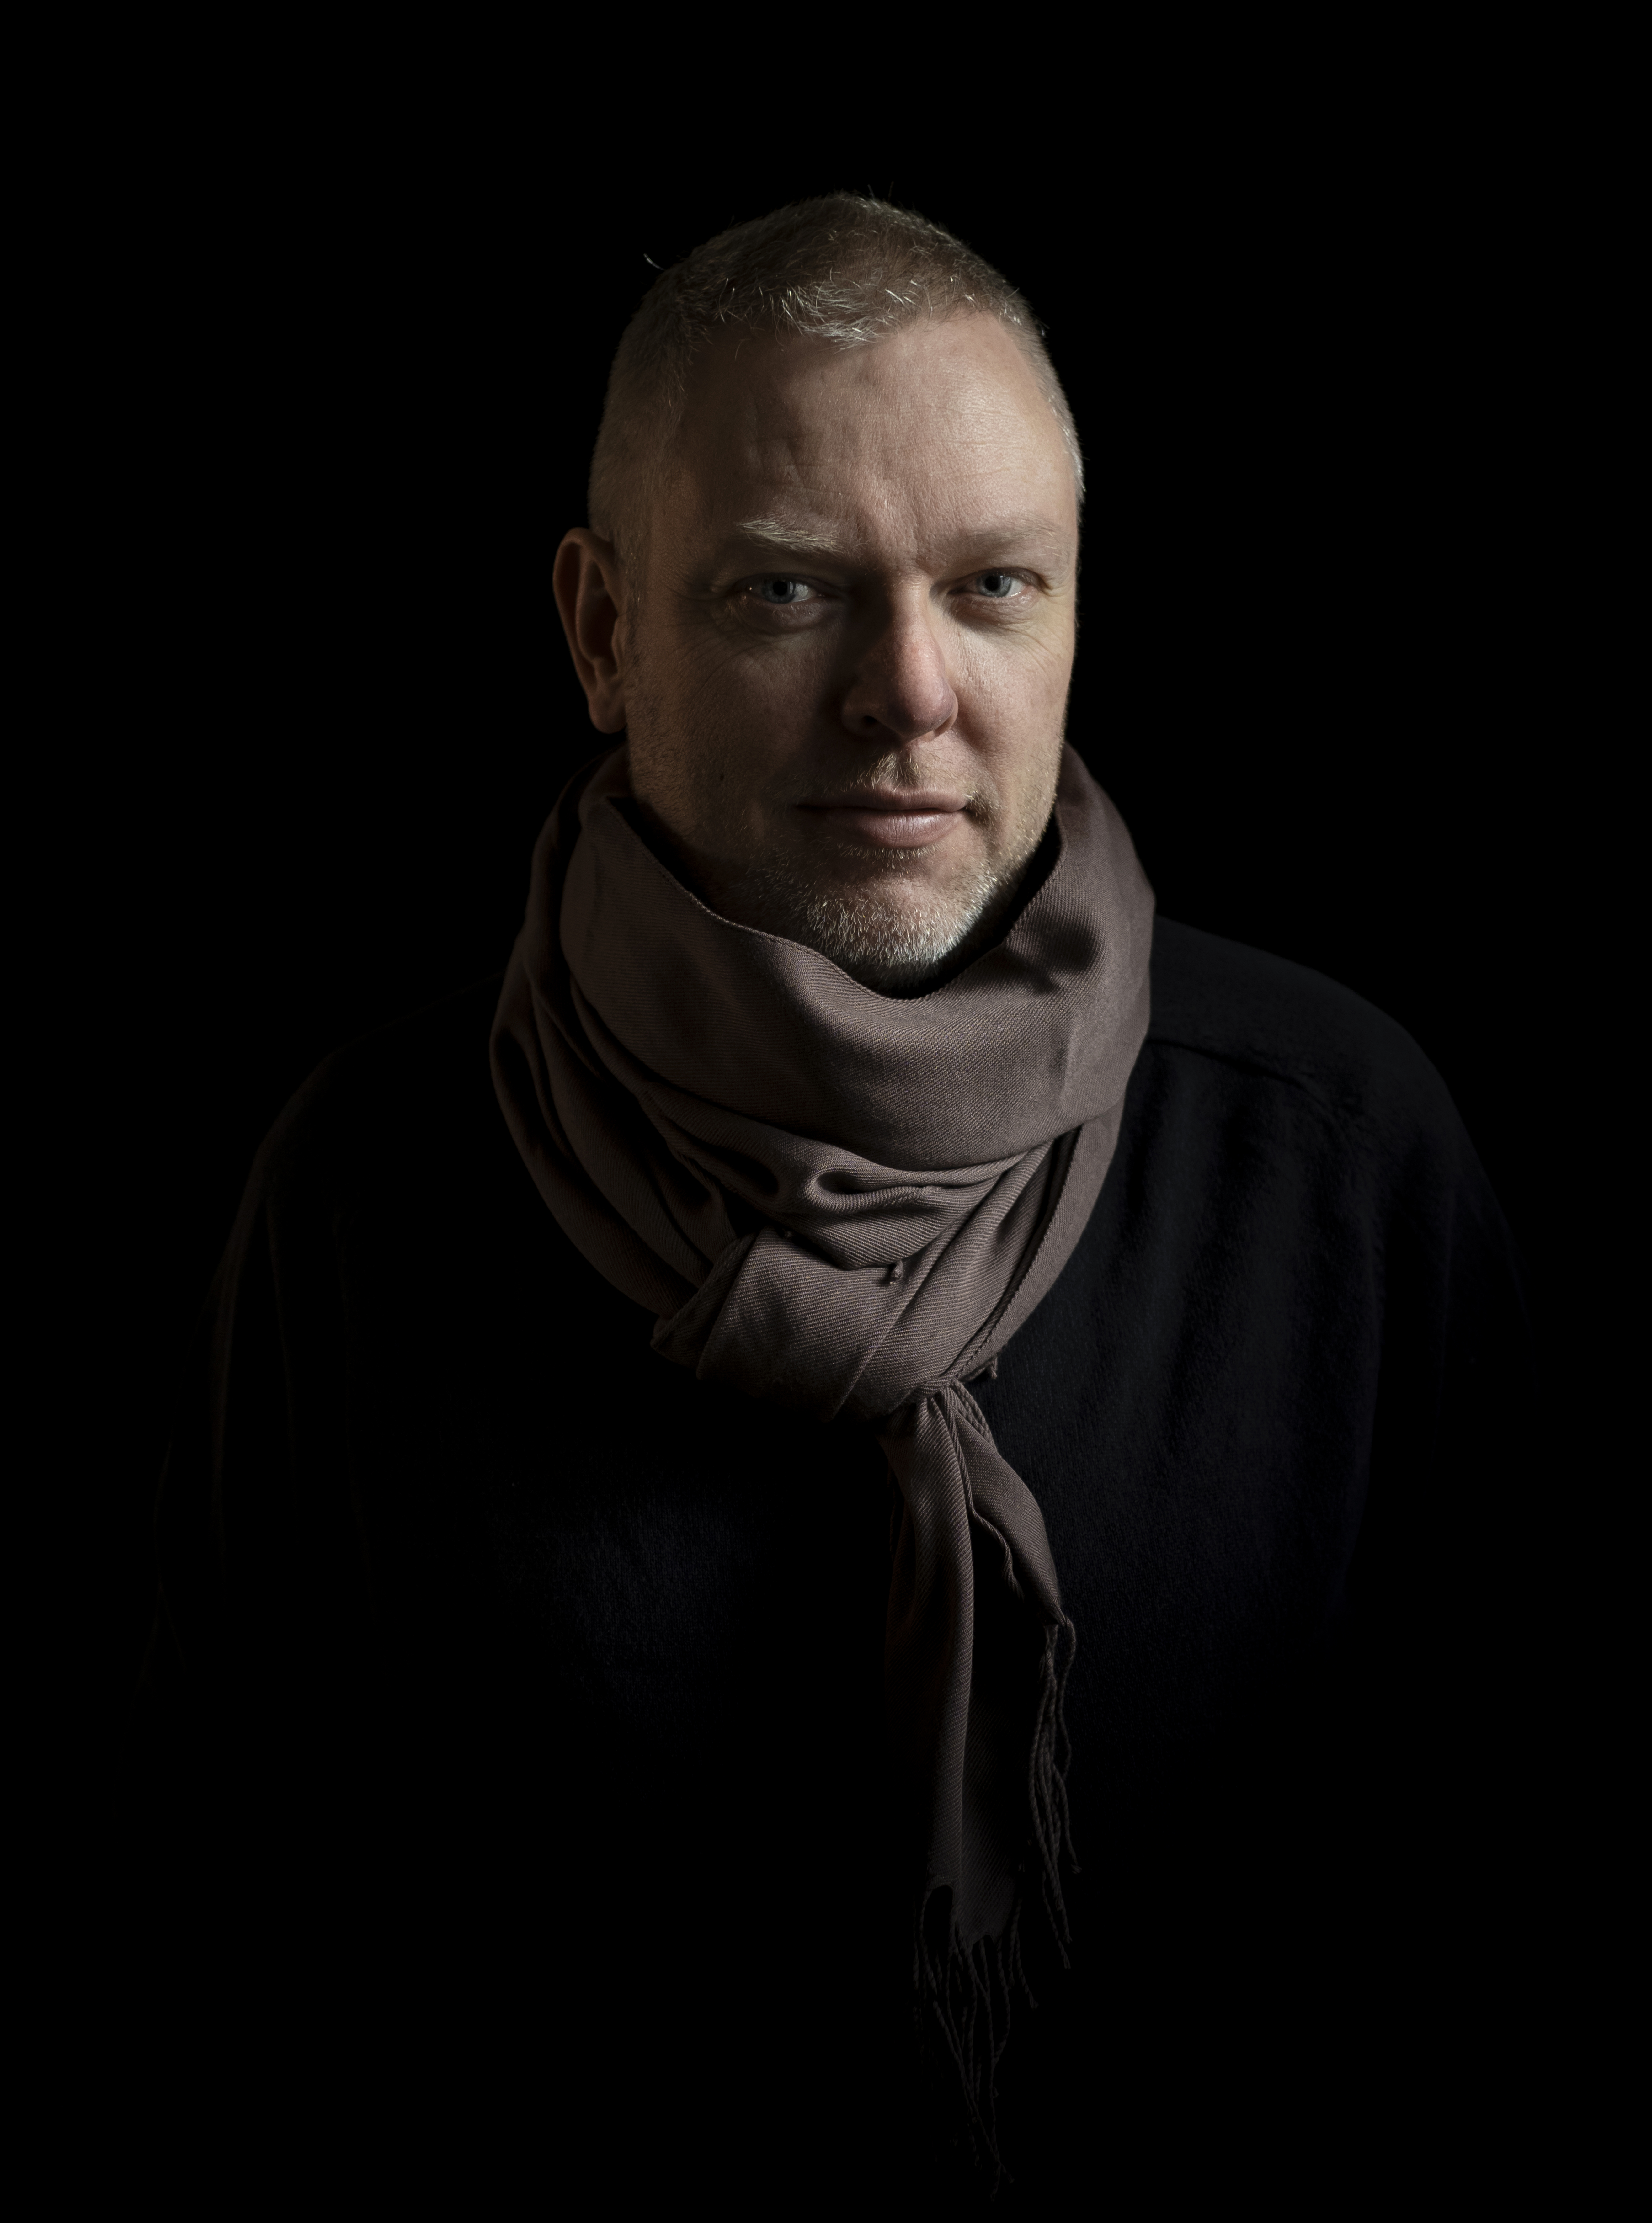 Sven Petter Næss